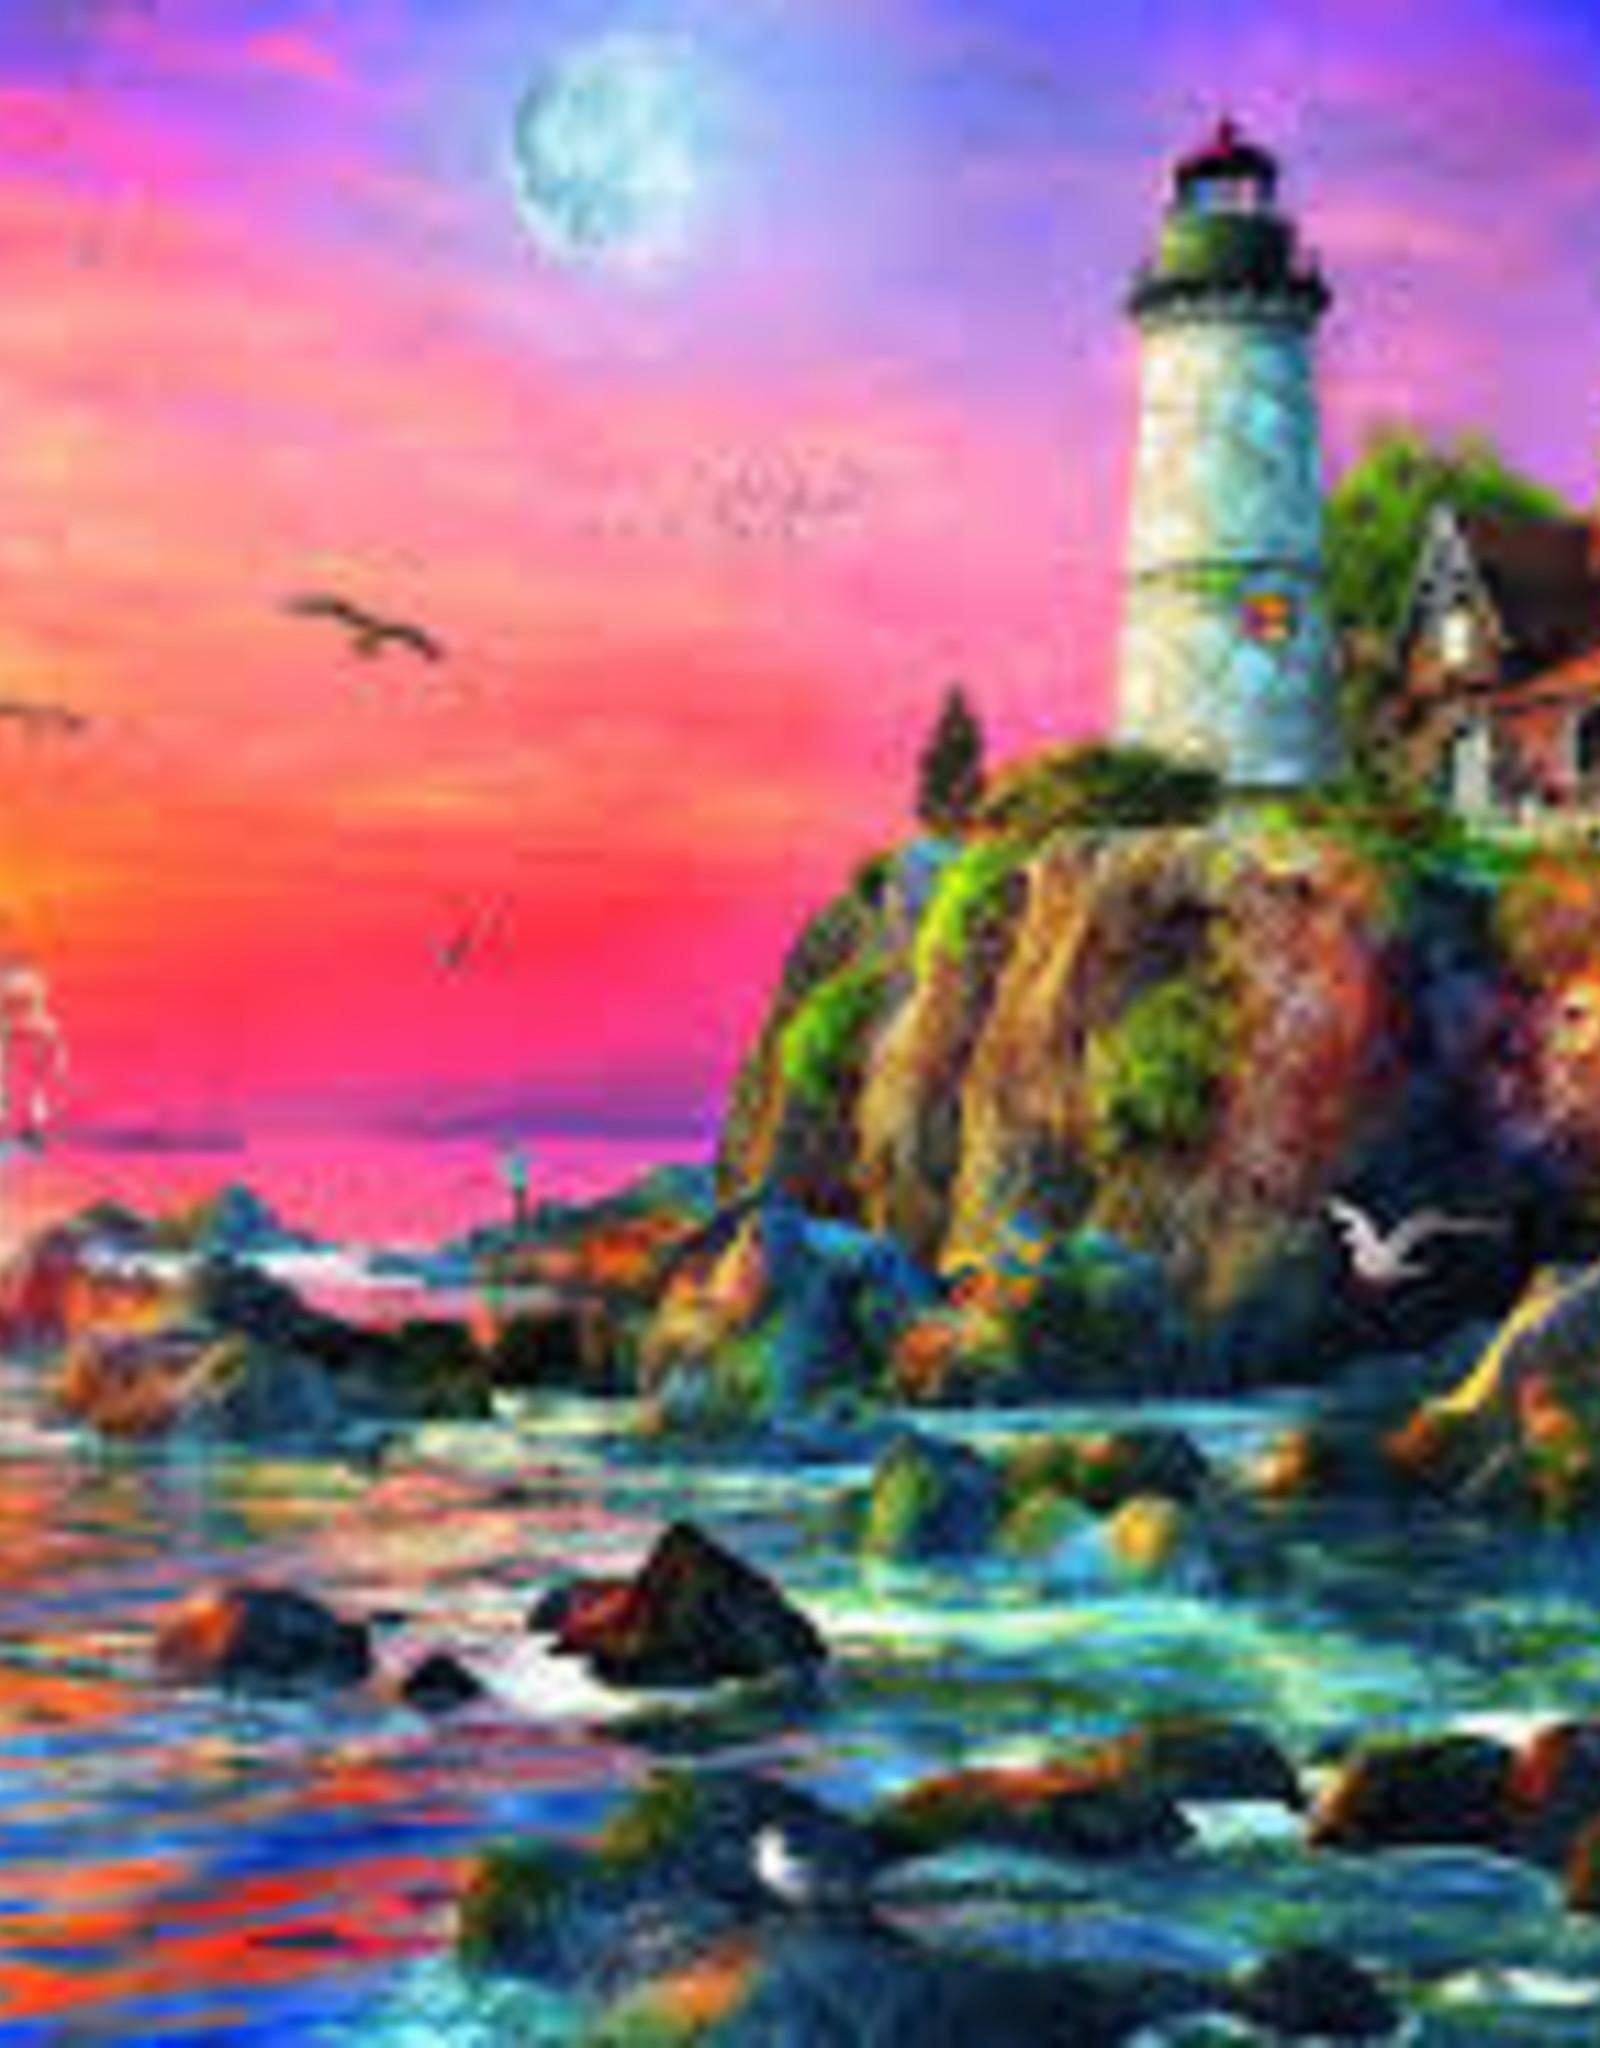 Ravensburger 500pc puzzle Lighthouse at Sunset